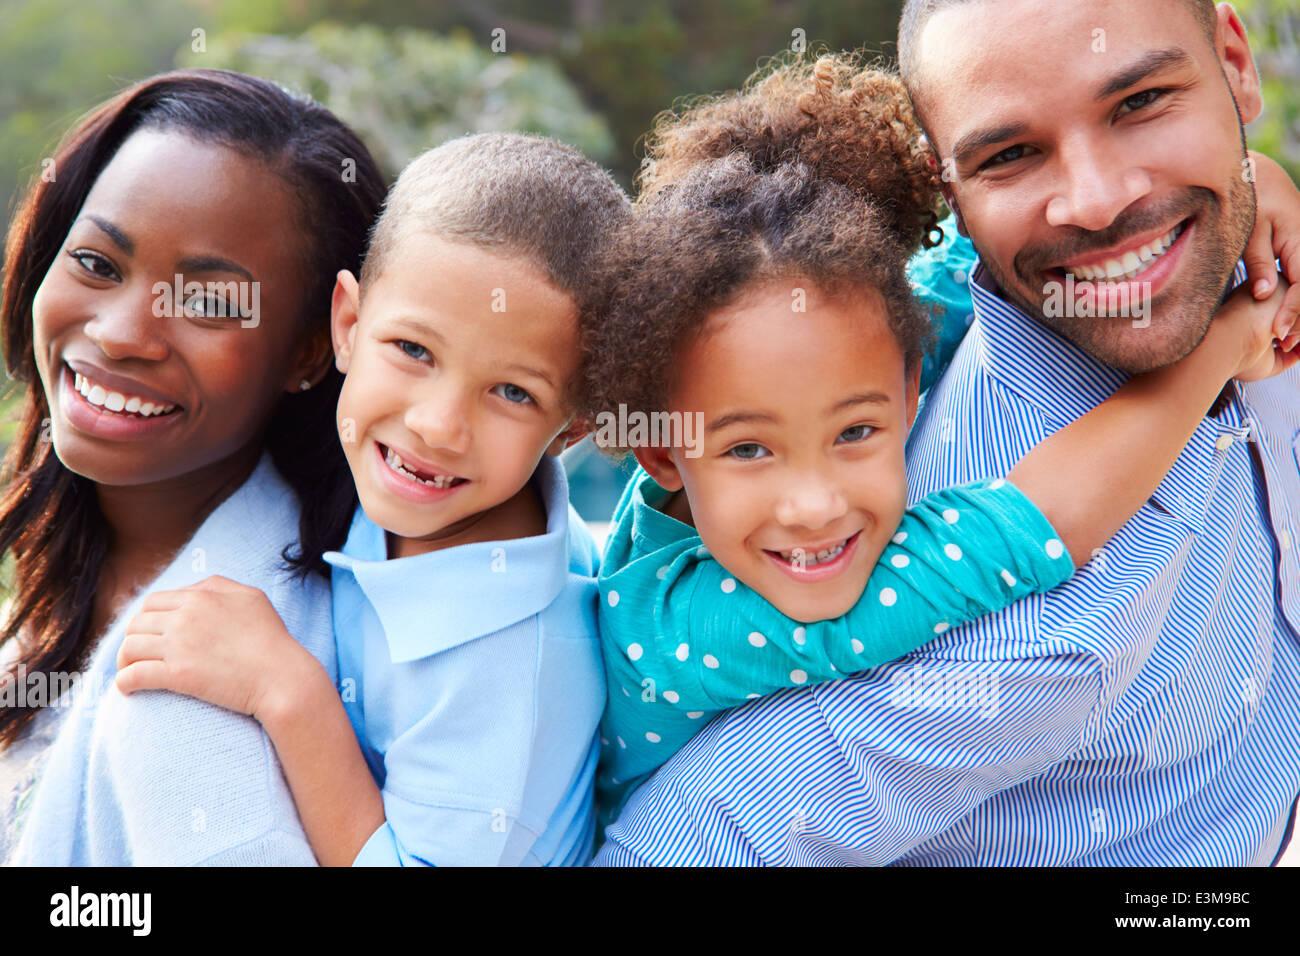 Retrato de familia americana africana en campo Imagen De Stock